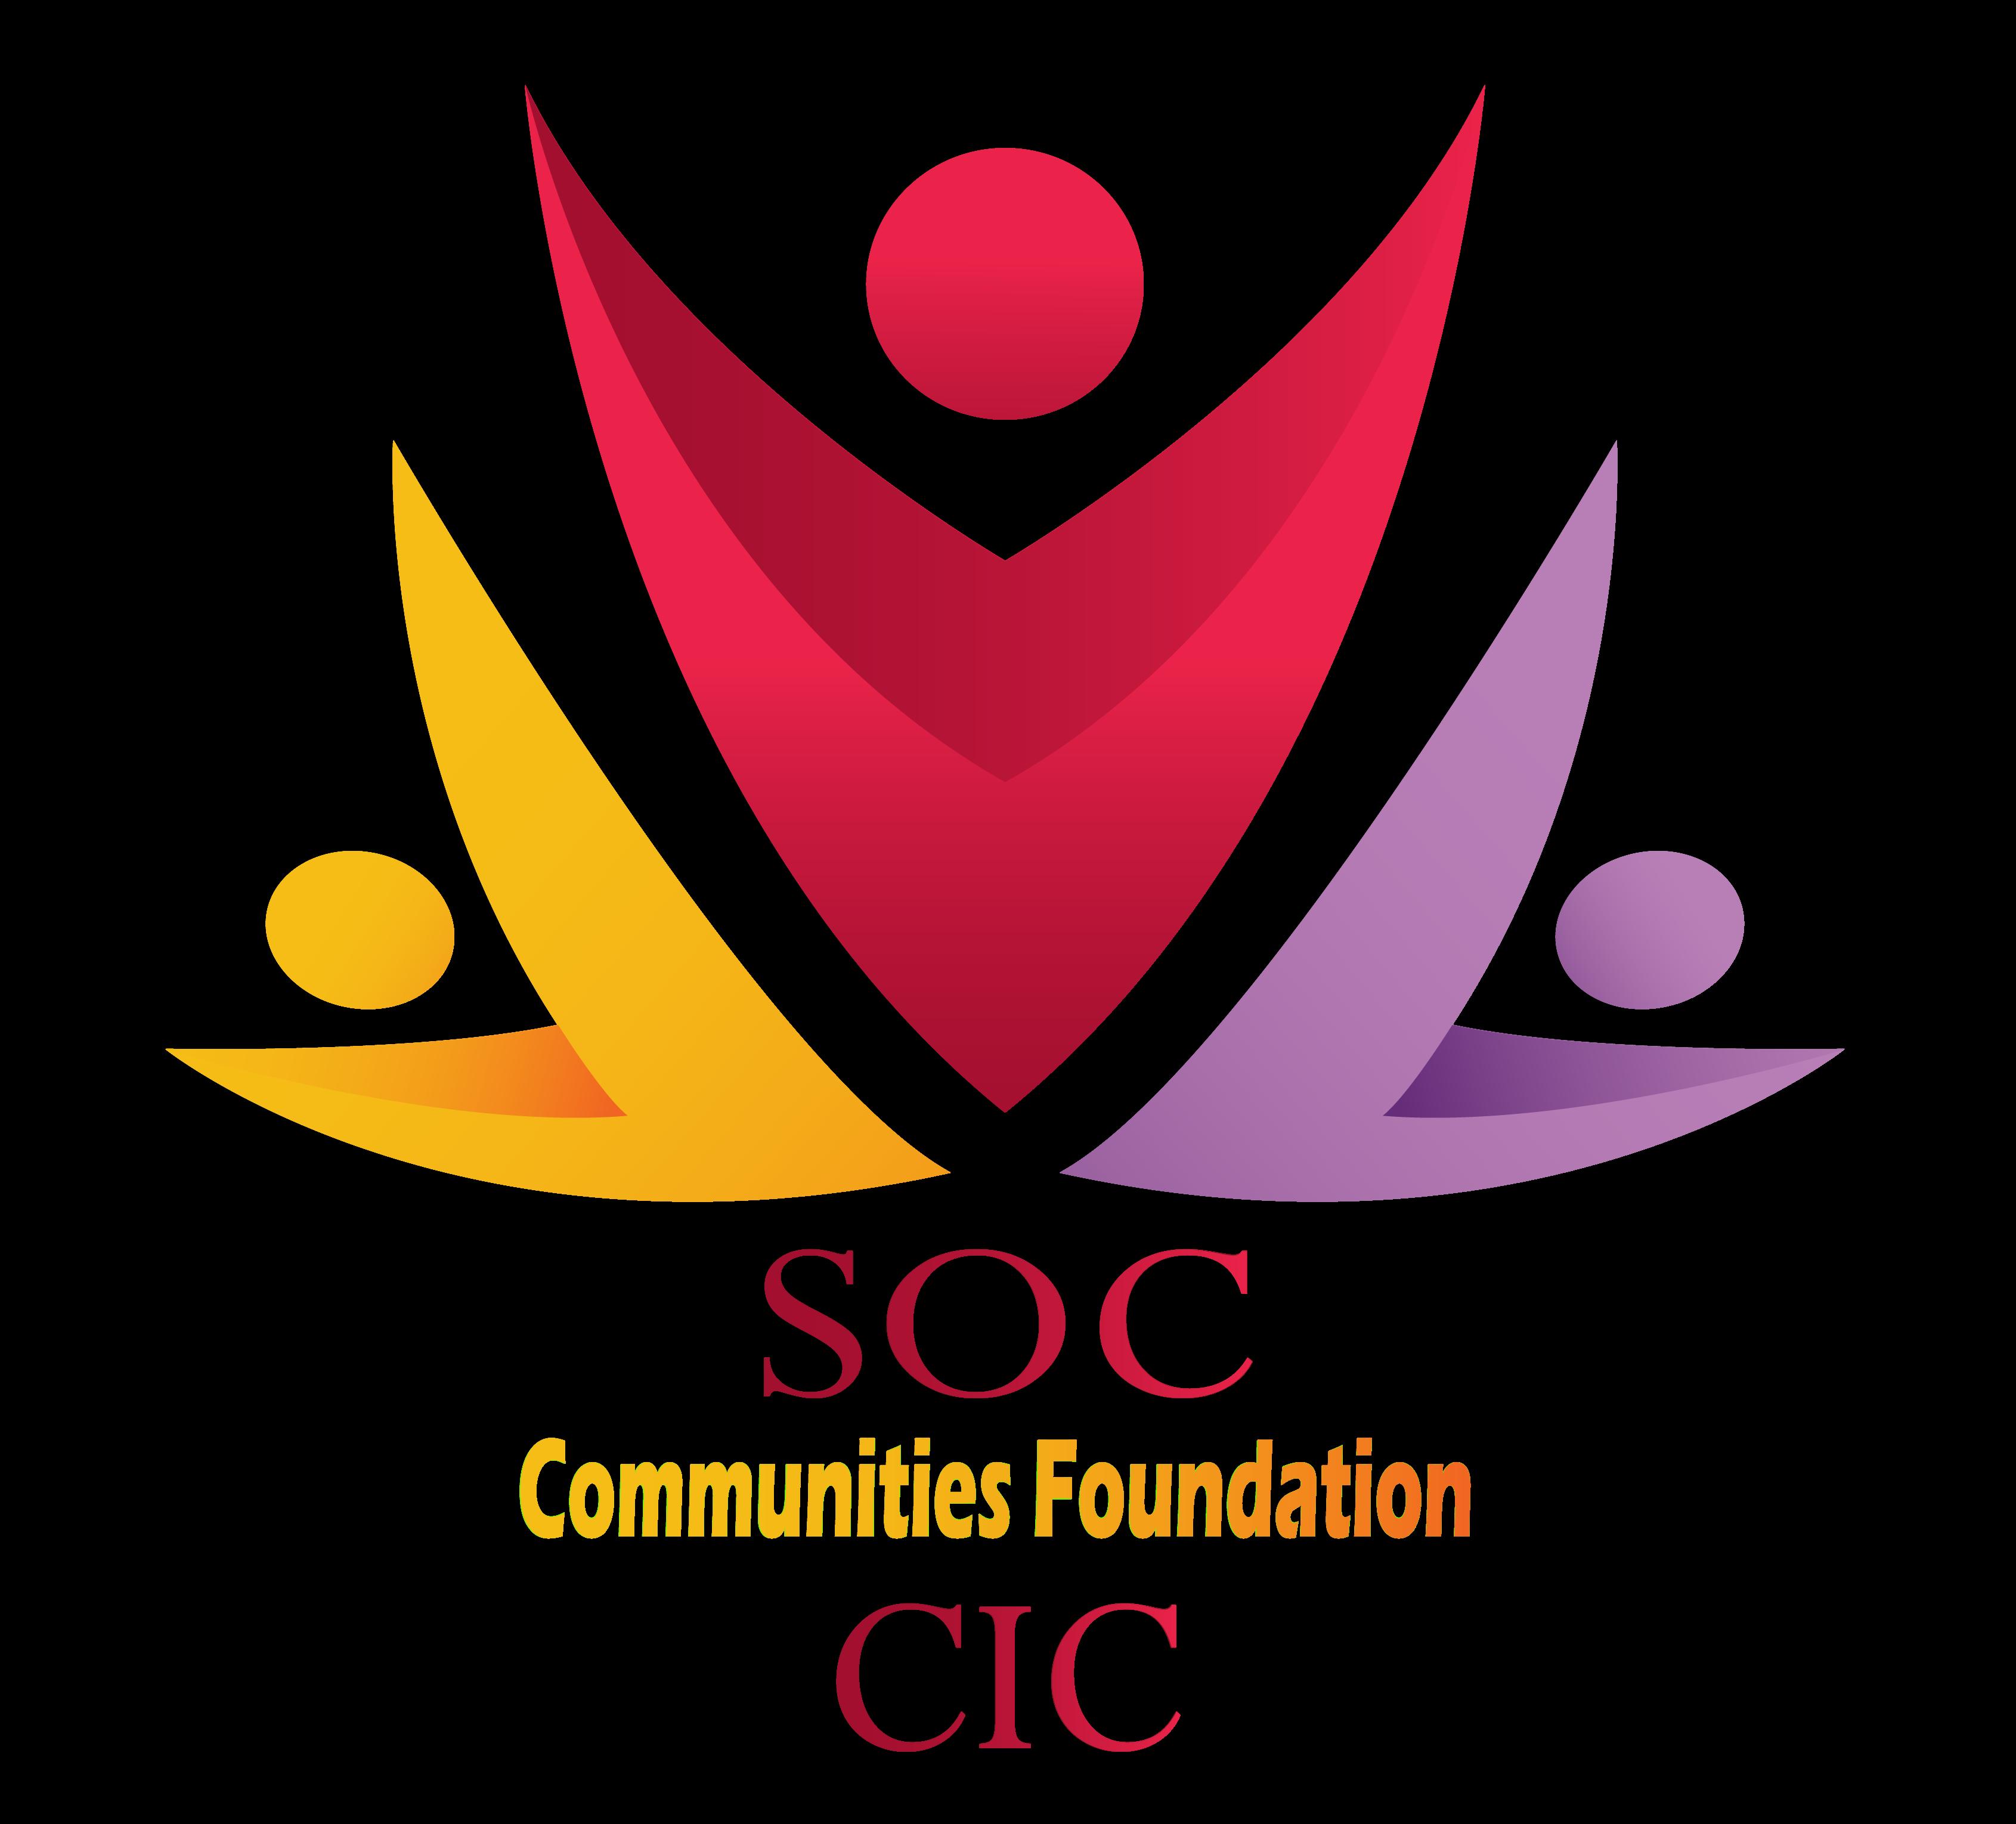 SOC COMMUNITIES FOUNDATION CIC